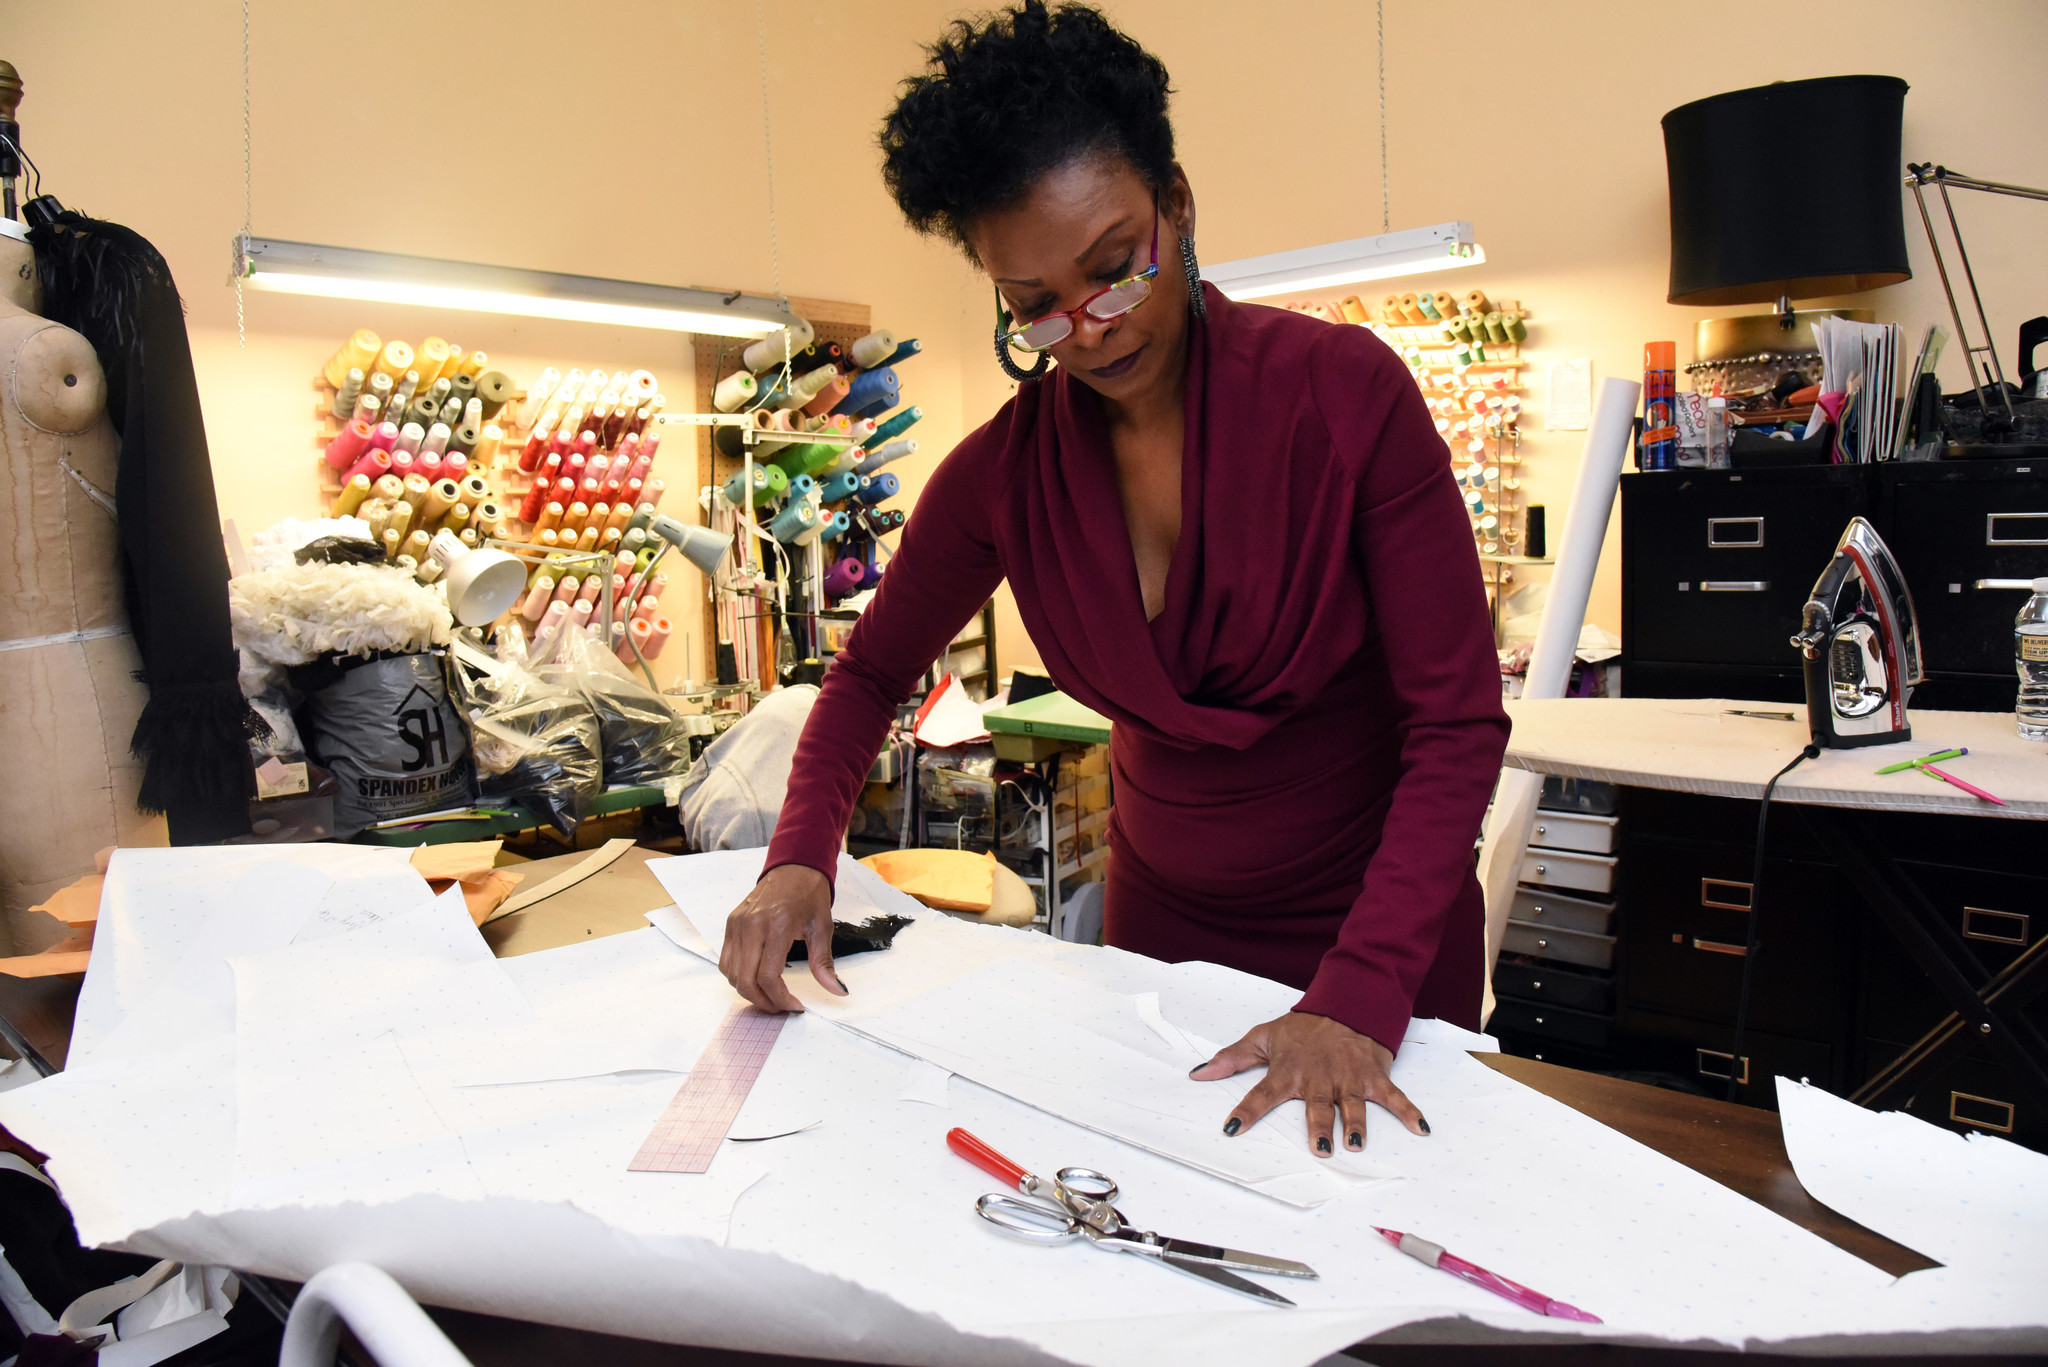 Product designer sketching - Designability